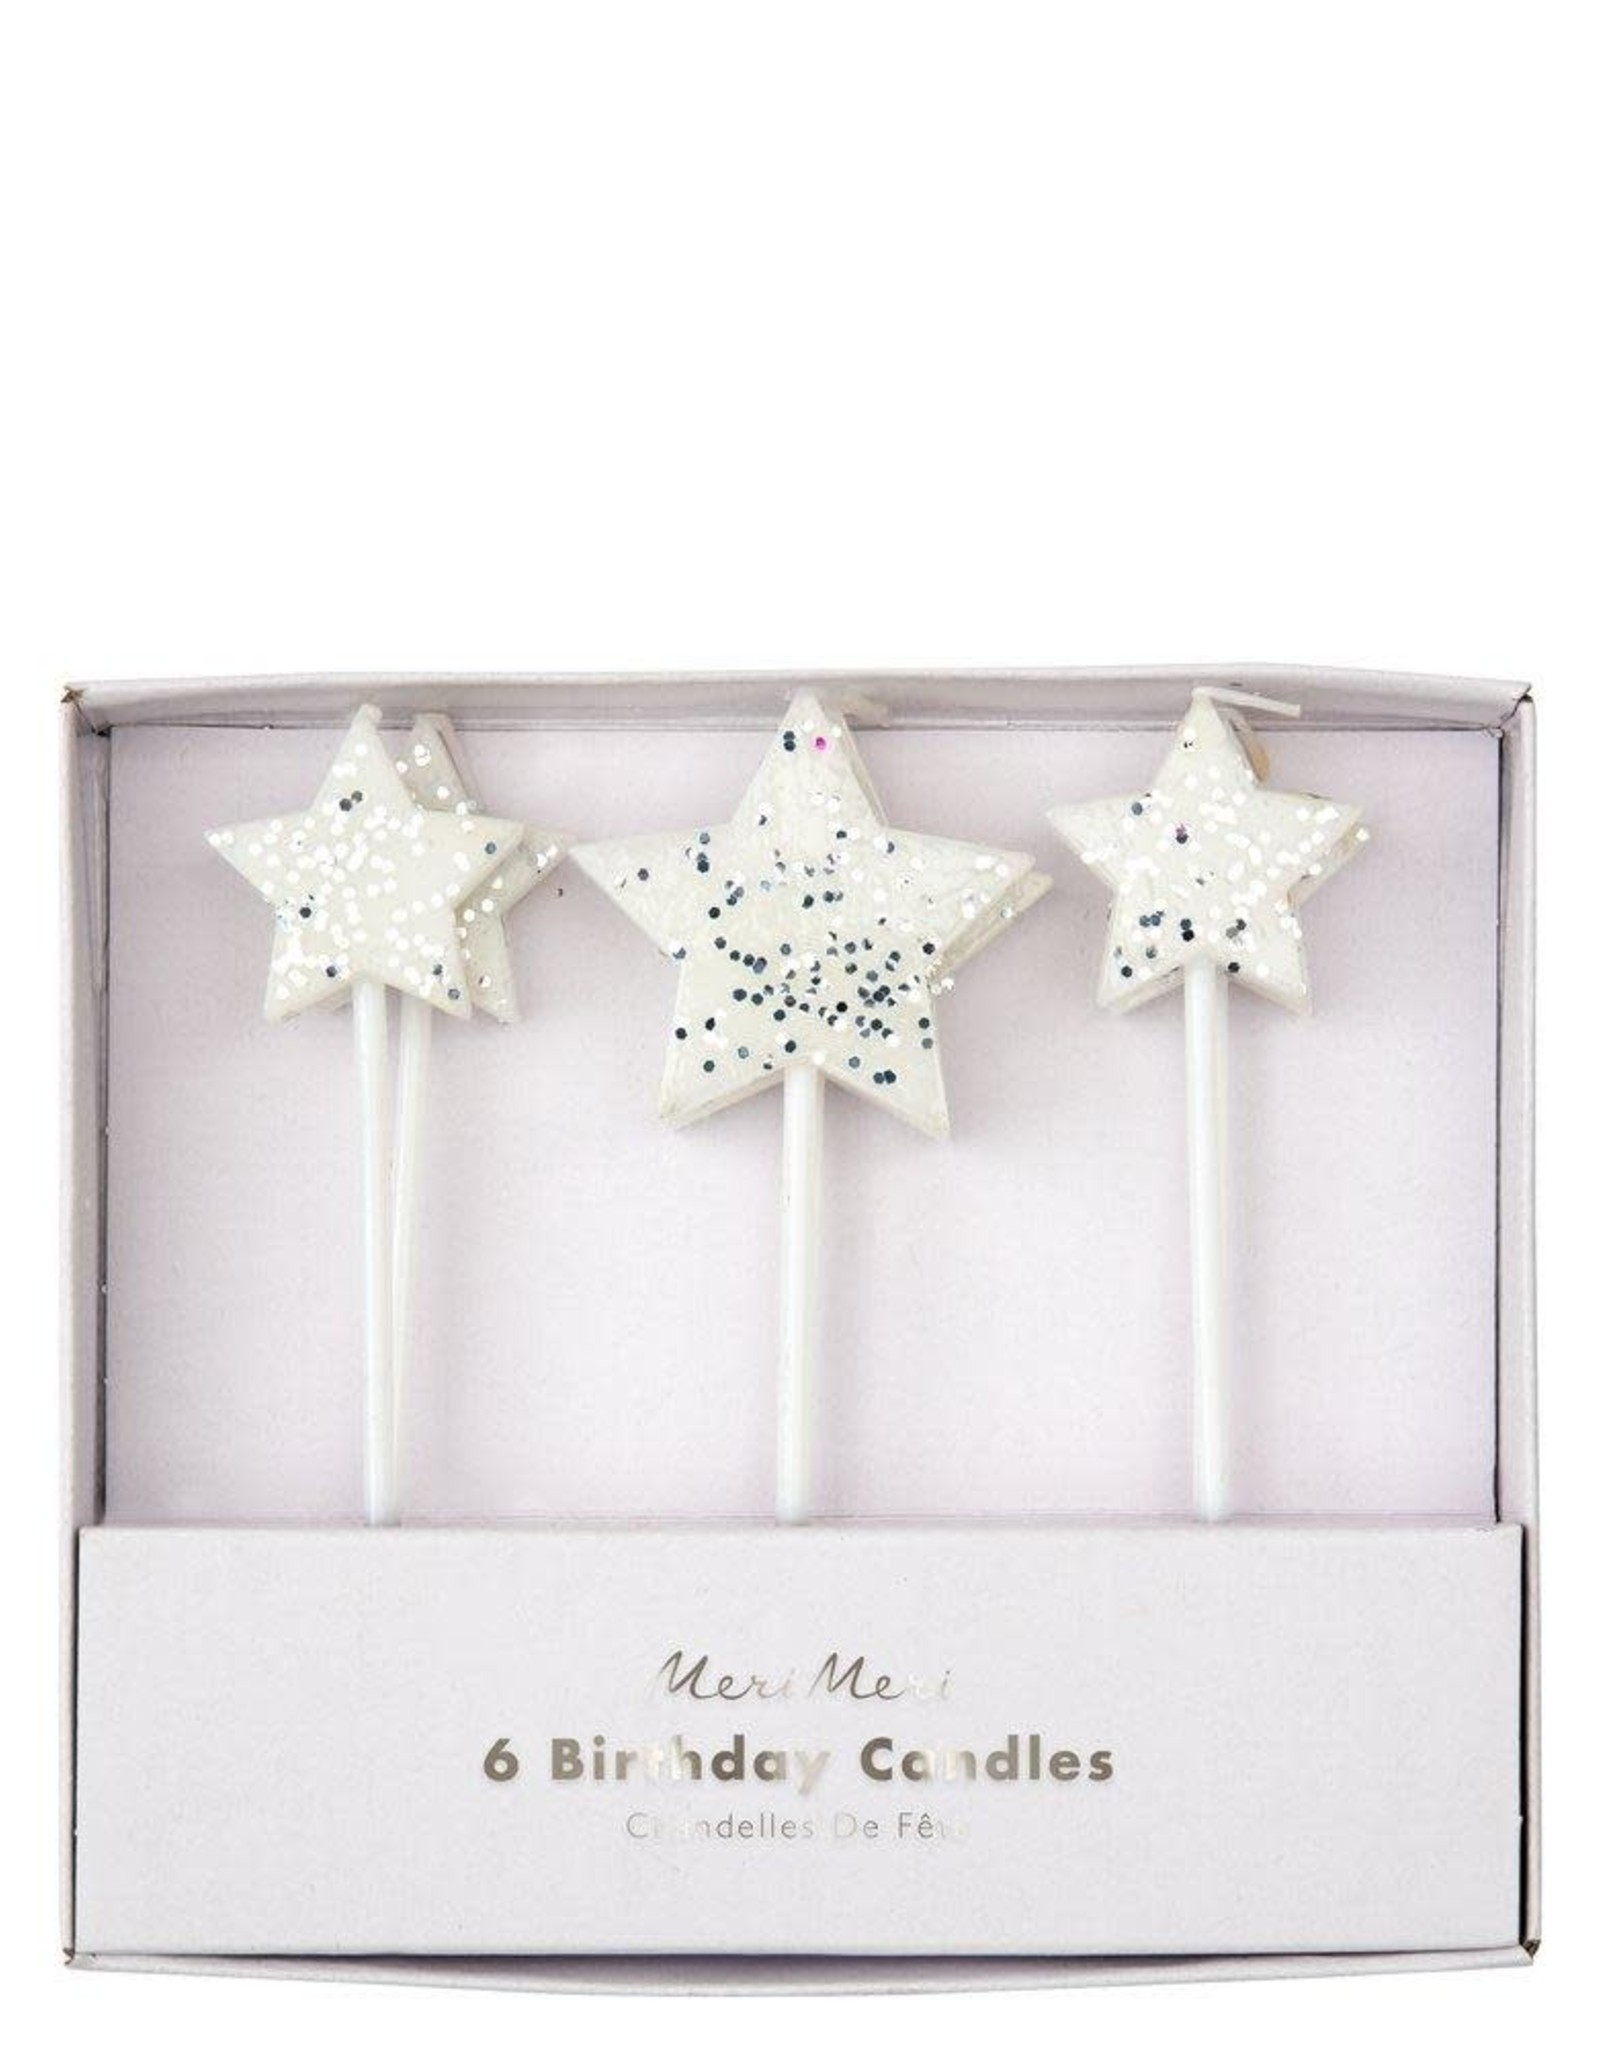 Meri Meri silver star candles